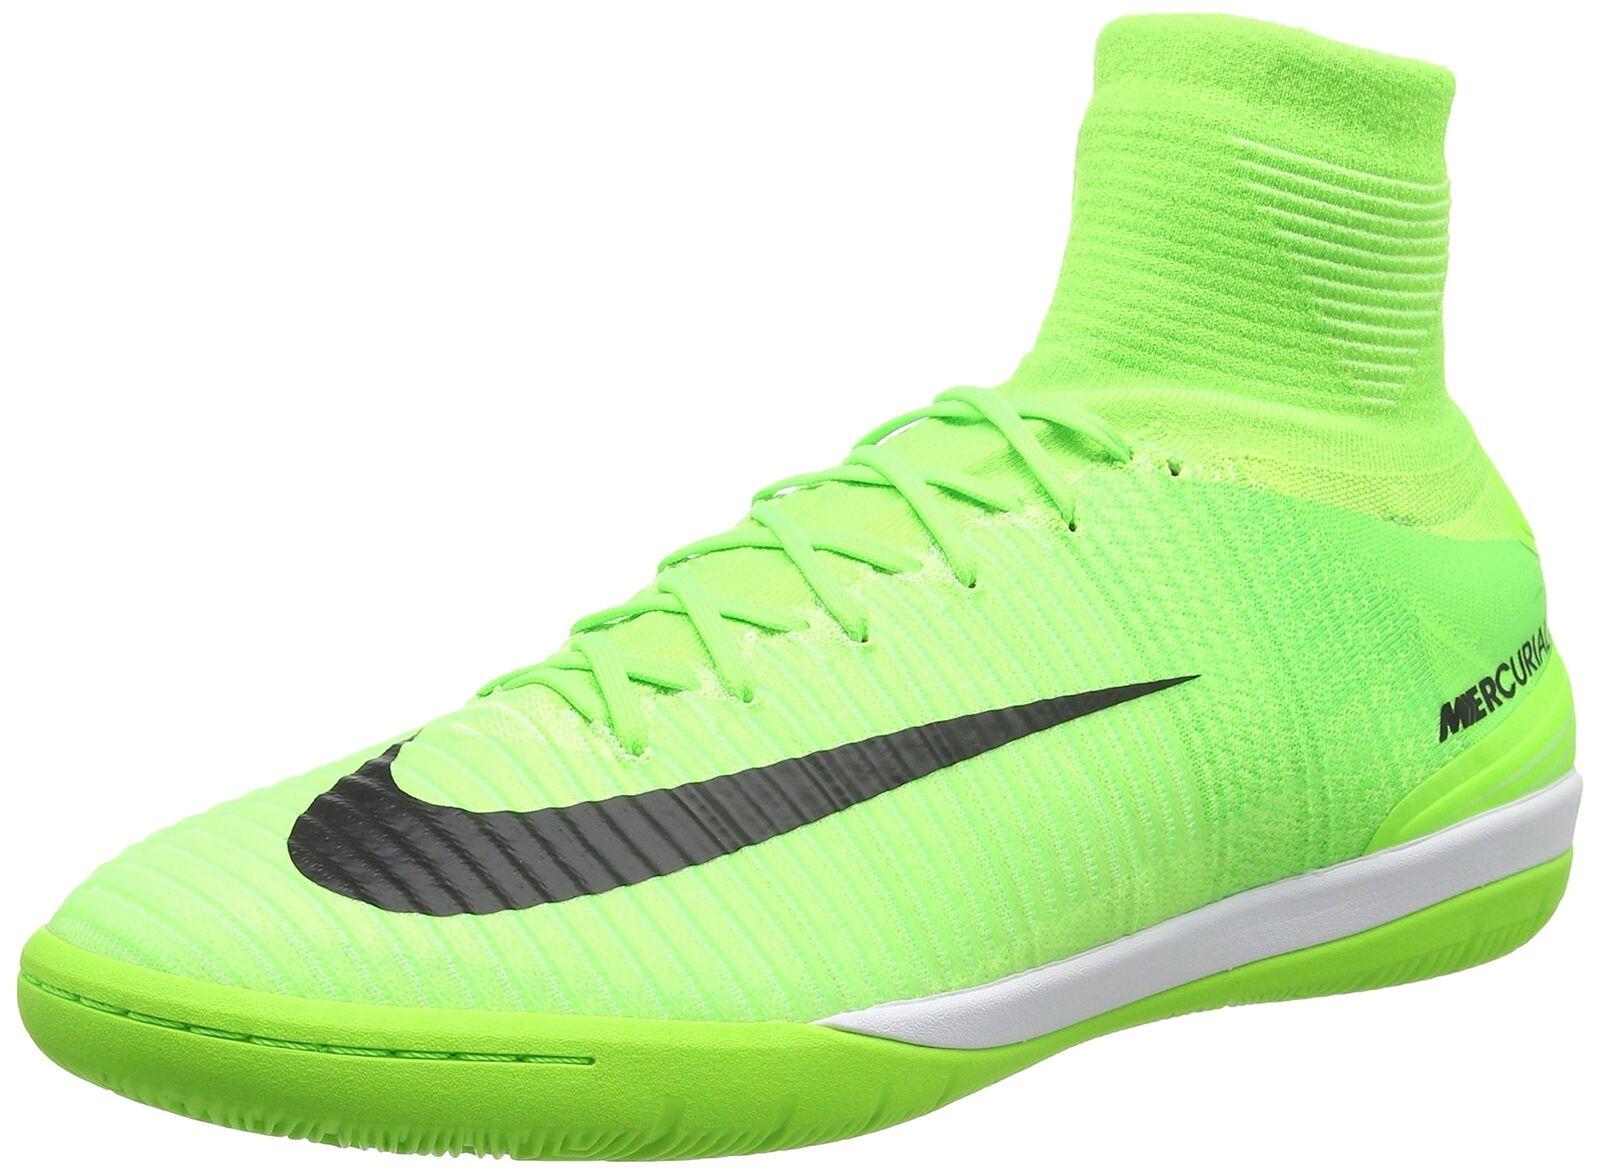 Nike mercurialx mercurialx mercurialx proximo ii - indoor - fußball - schuh nib 6c6506